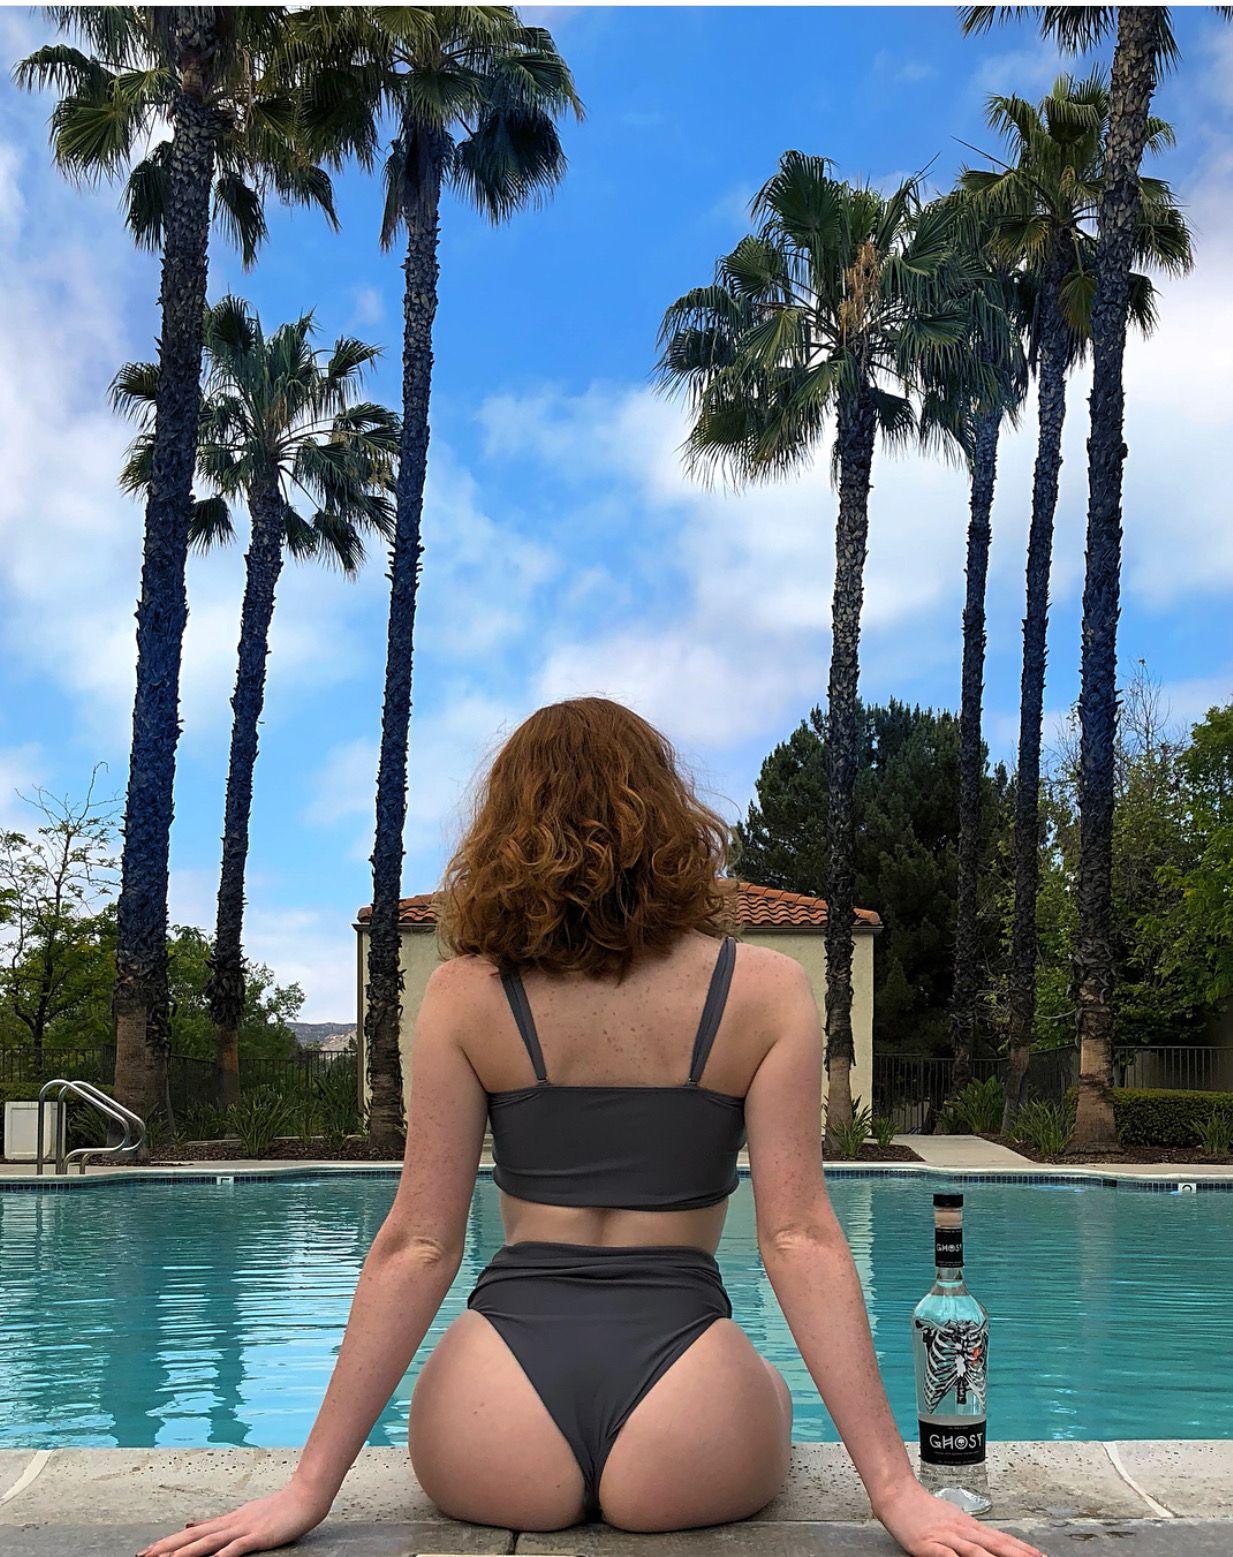 Ass Abigale Mandler nude (36 photo), Sexy, Bikini, Twitter, braless 2019